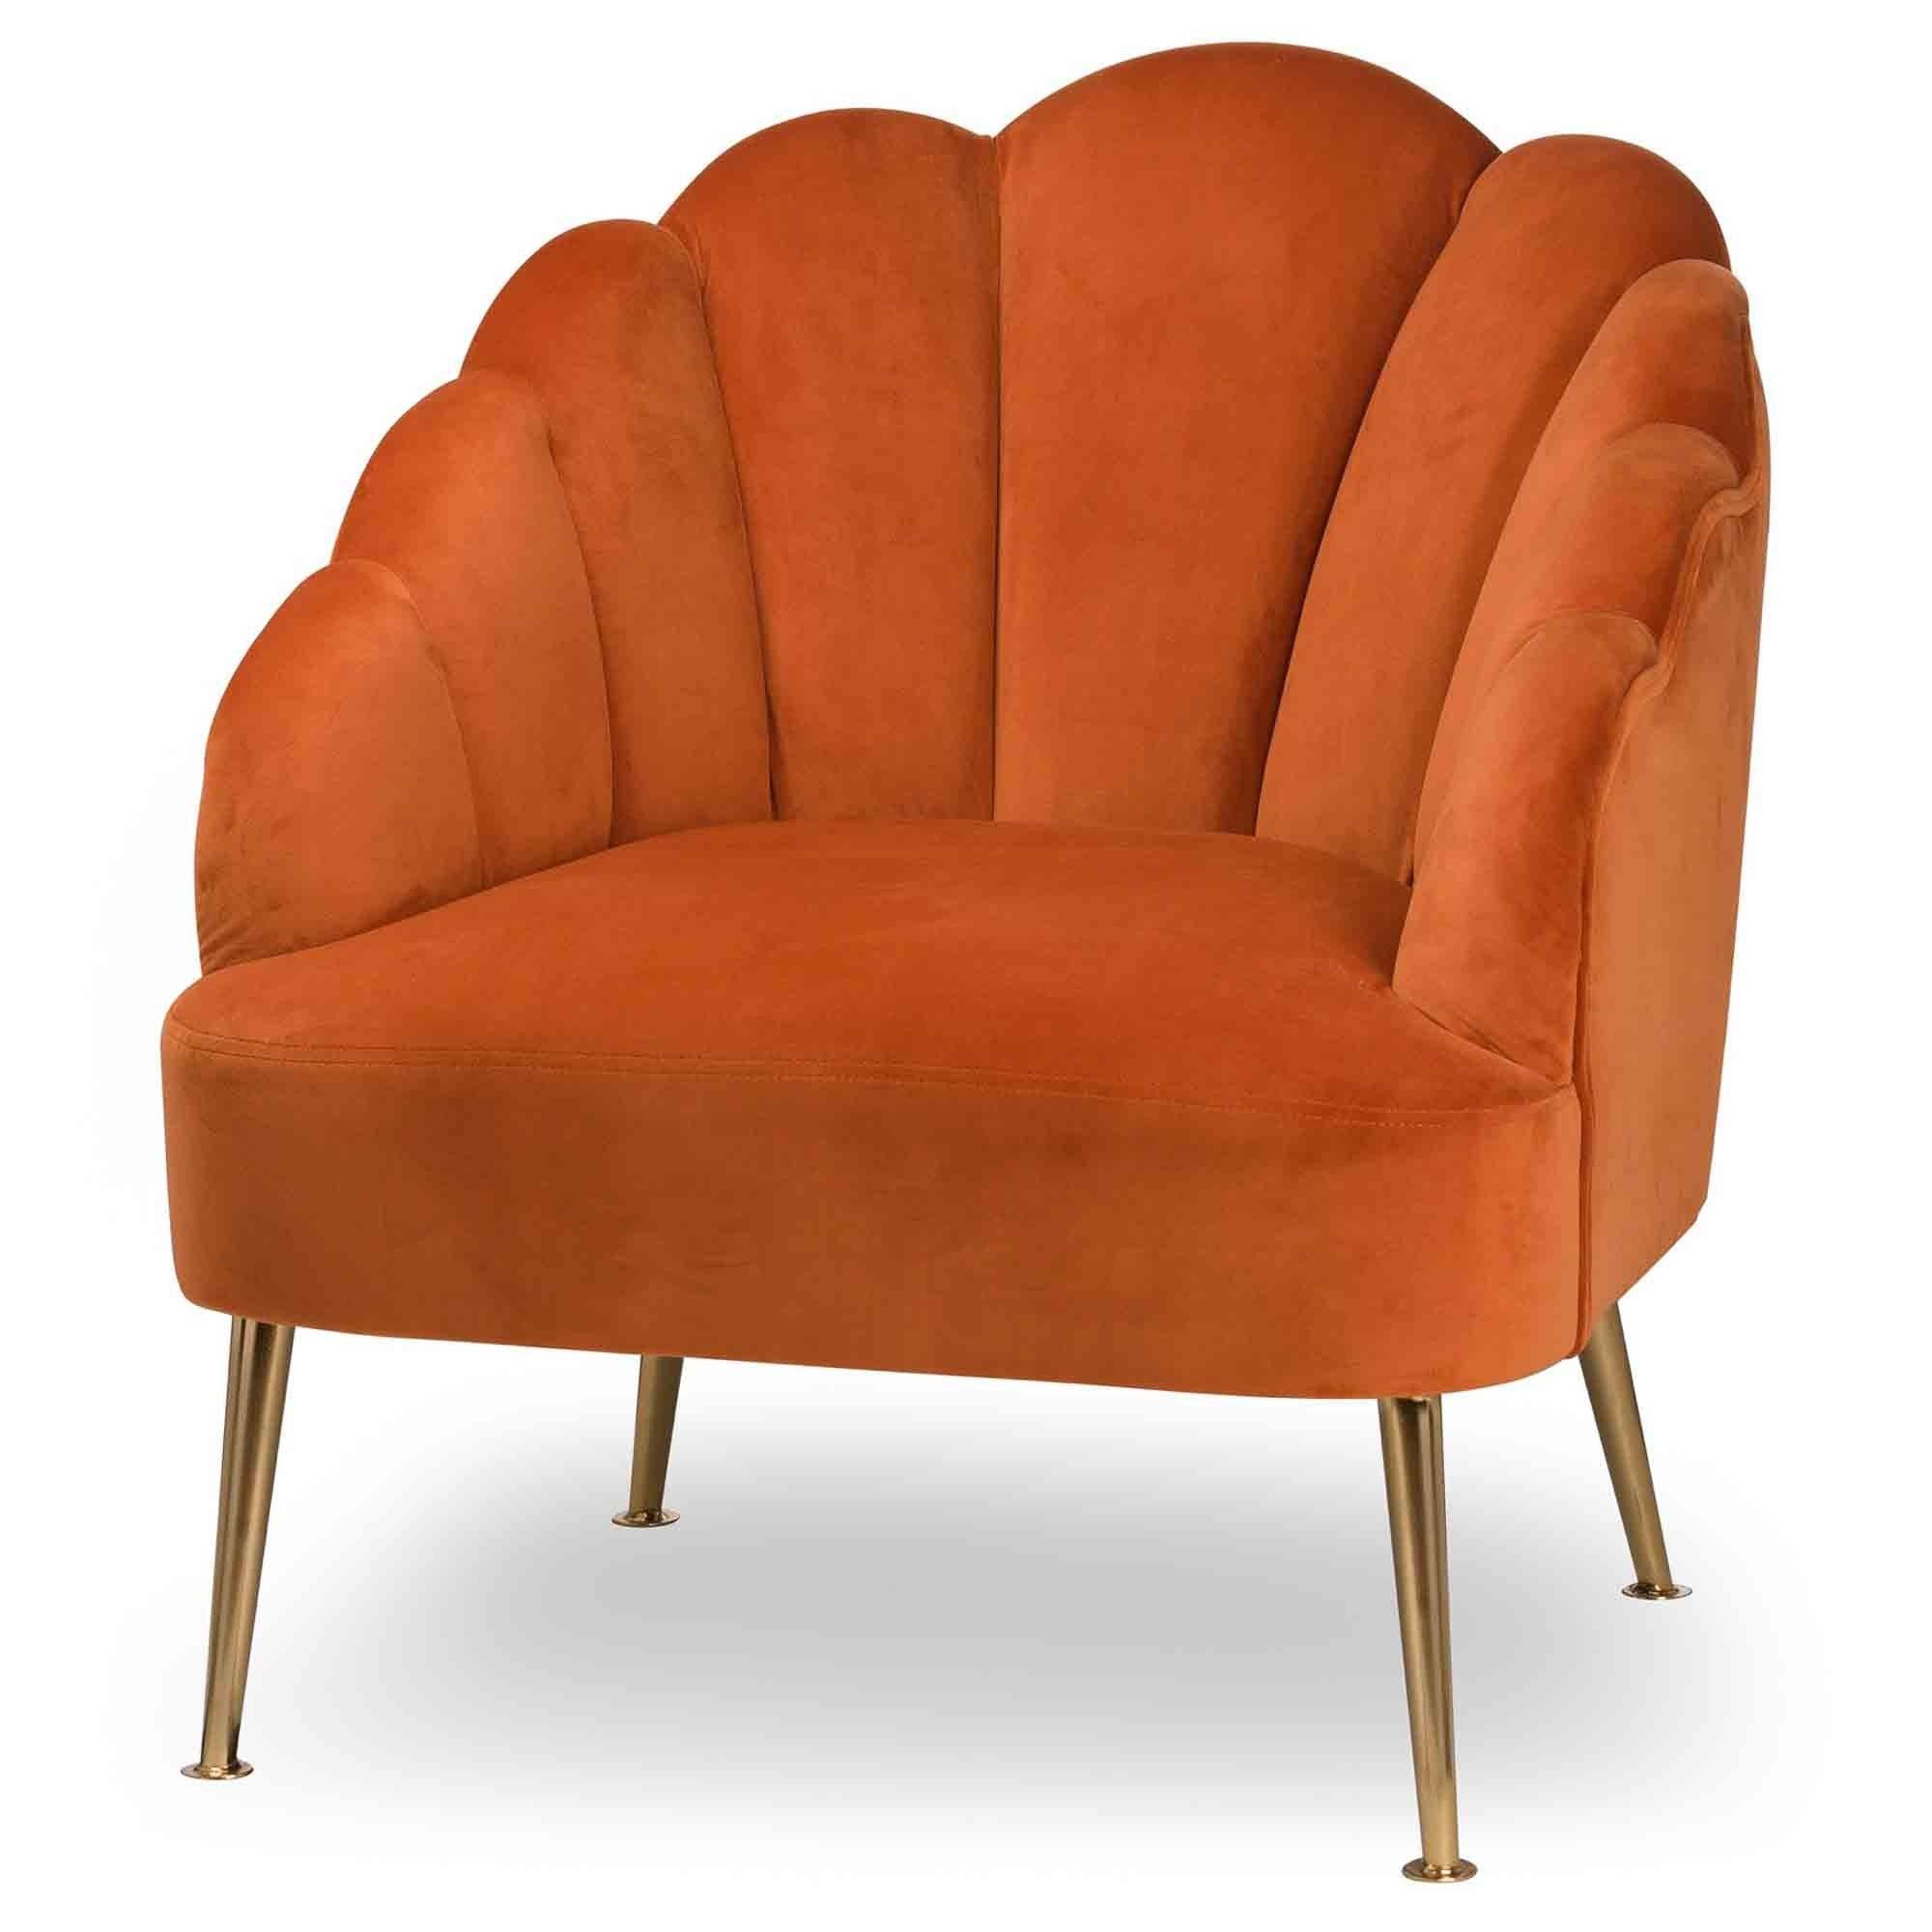 Picture of: Burnt Orange Velvet Teacup Chair Velvet Chairs Chairs